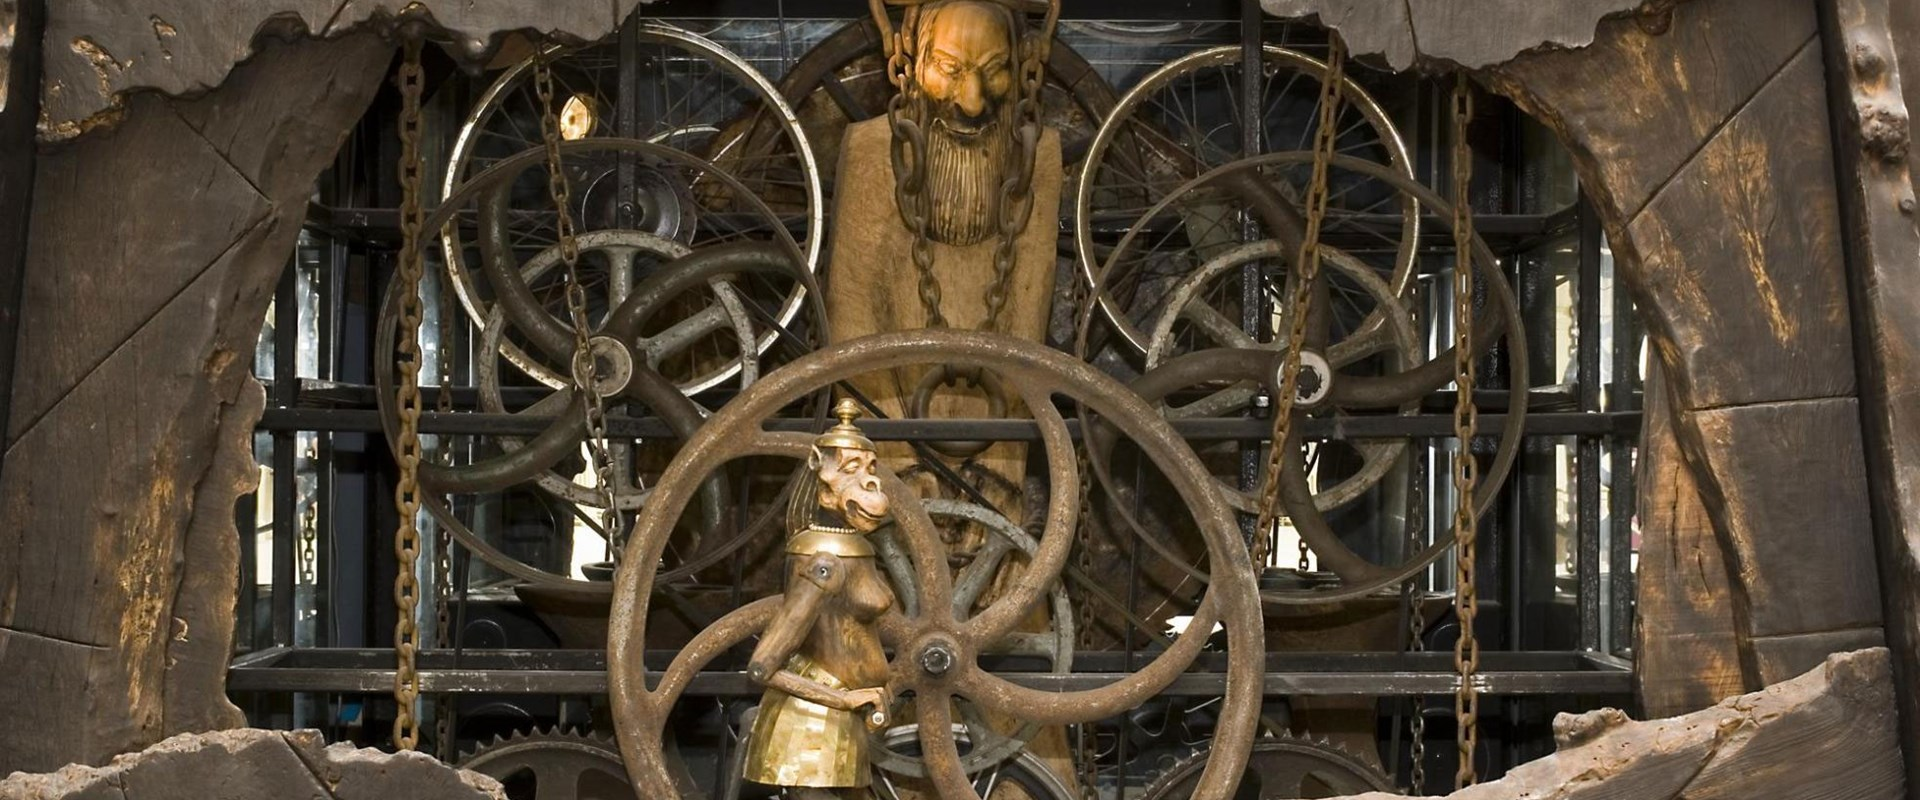 Glockenheim Clock Germany |